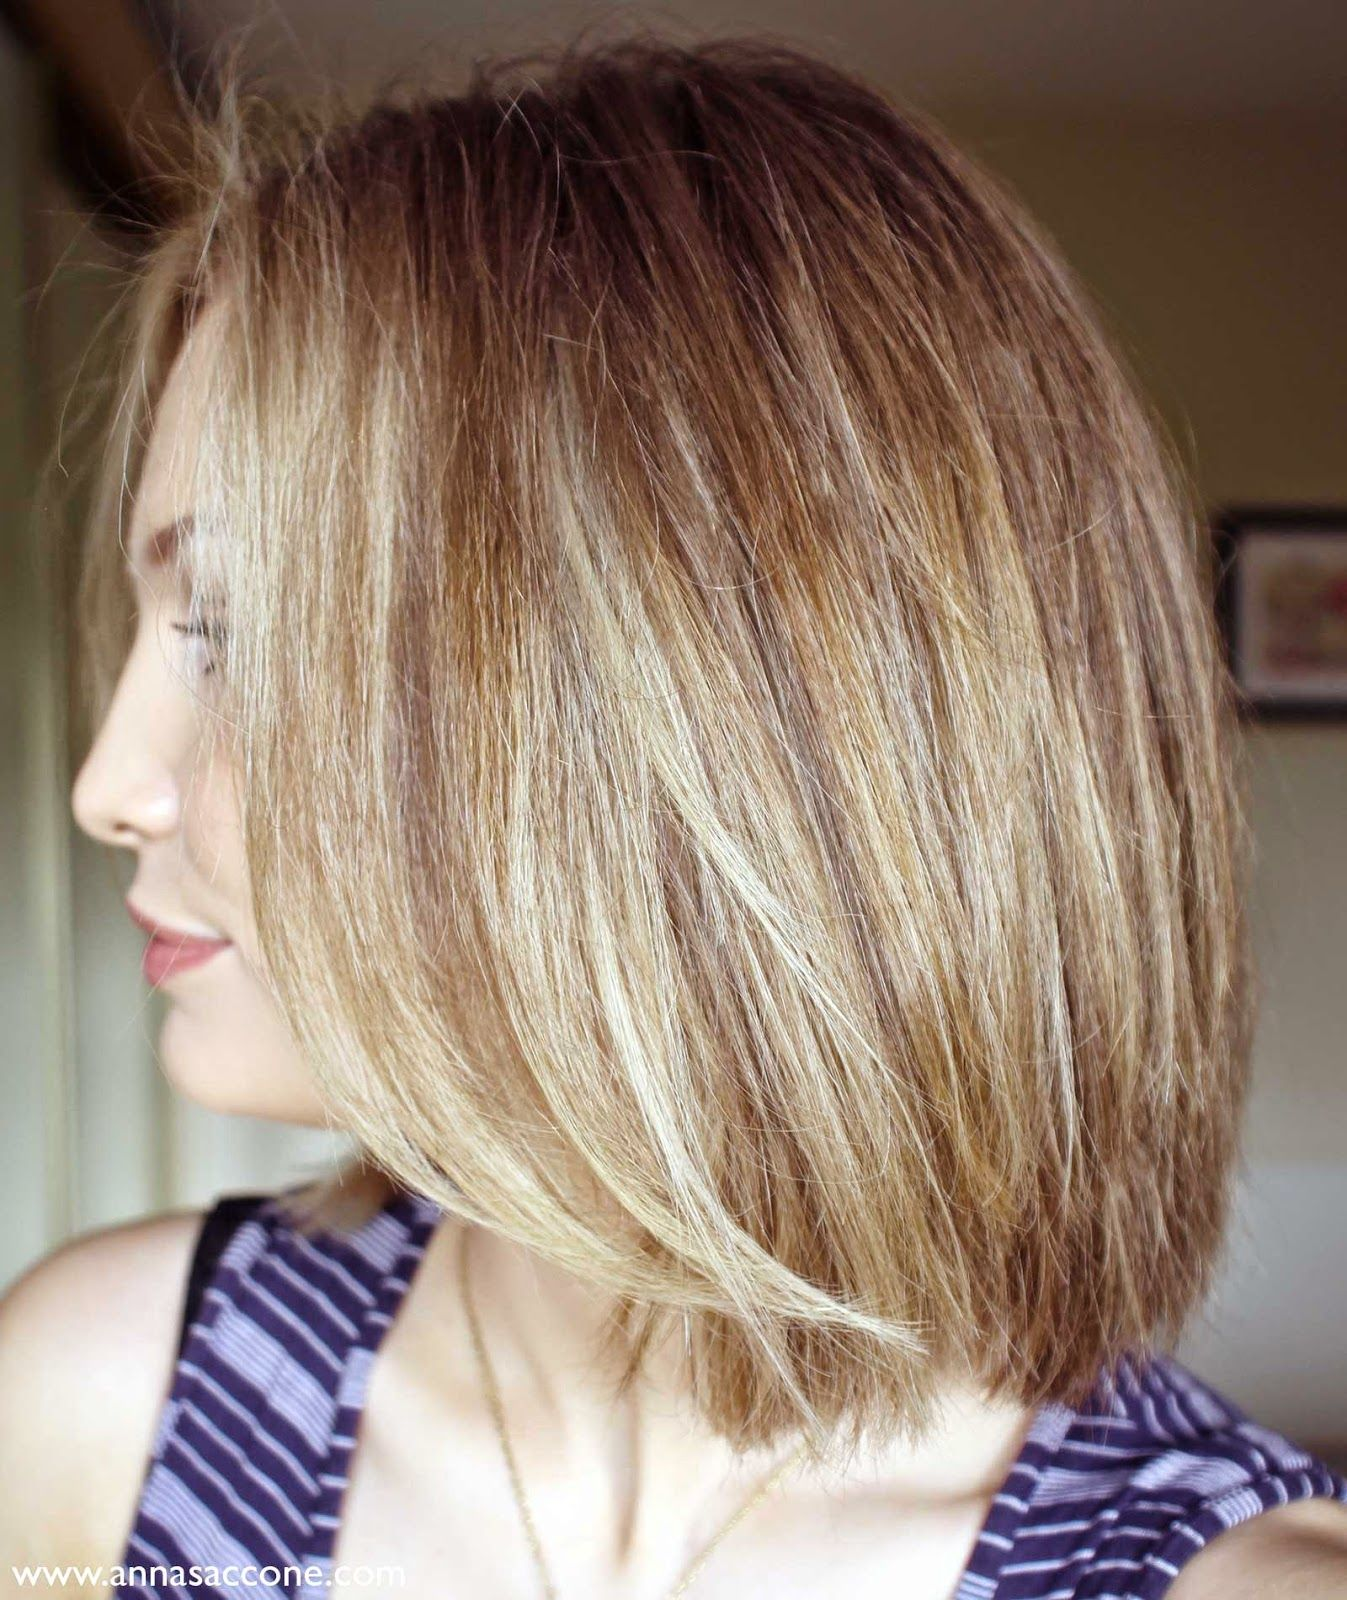 Anna Saccone Beauty Tuesday How To Style a Long Angled Bob